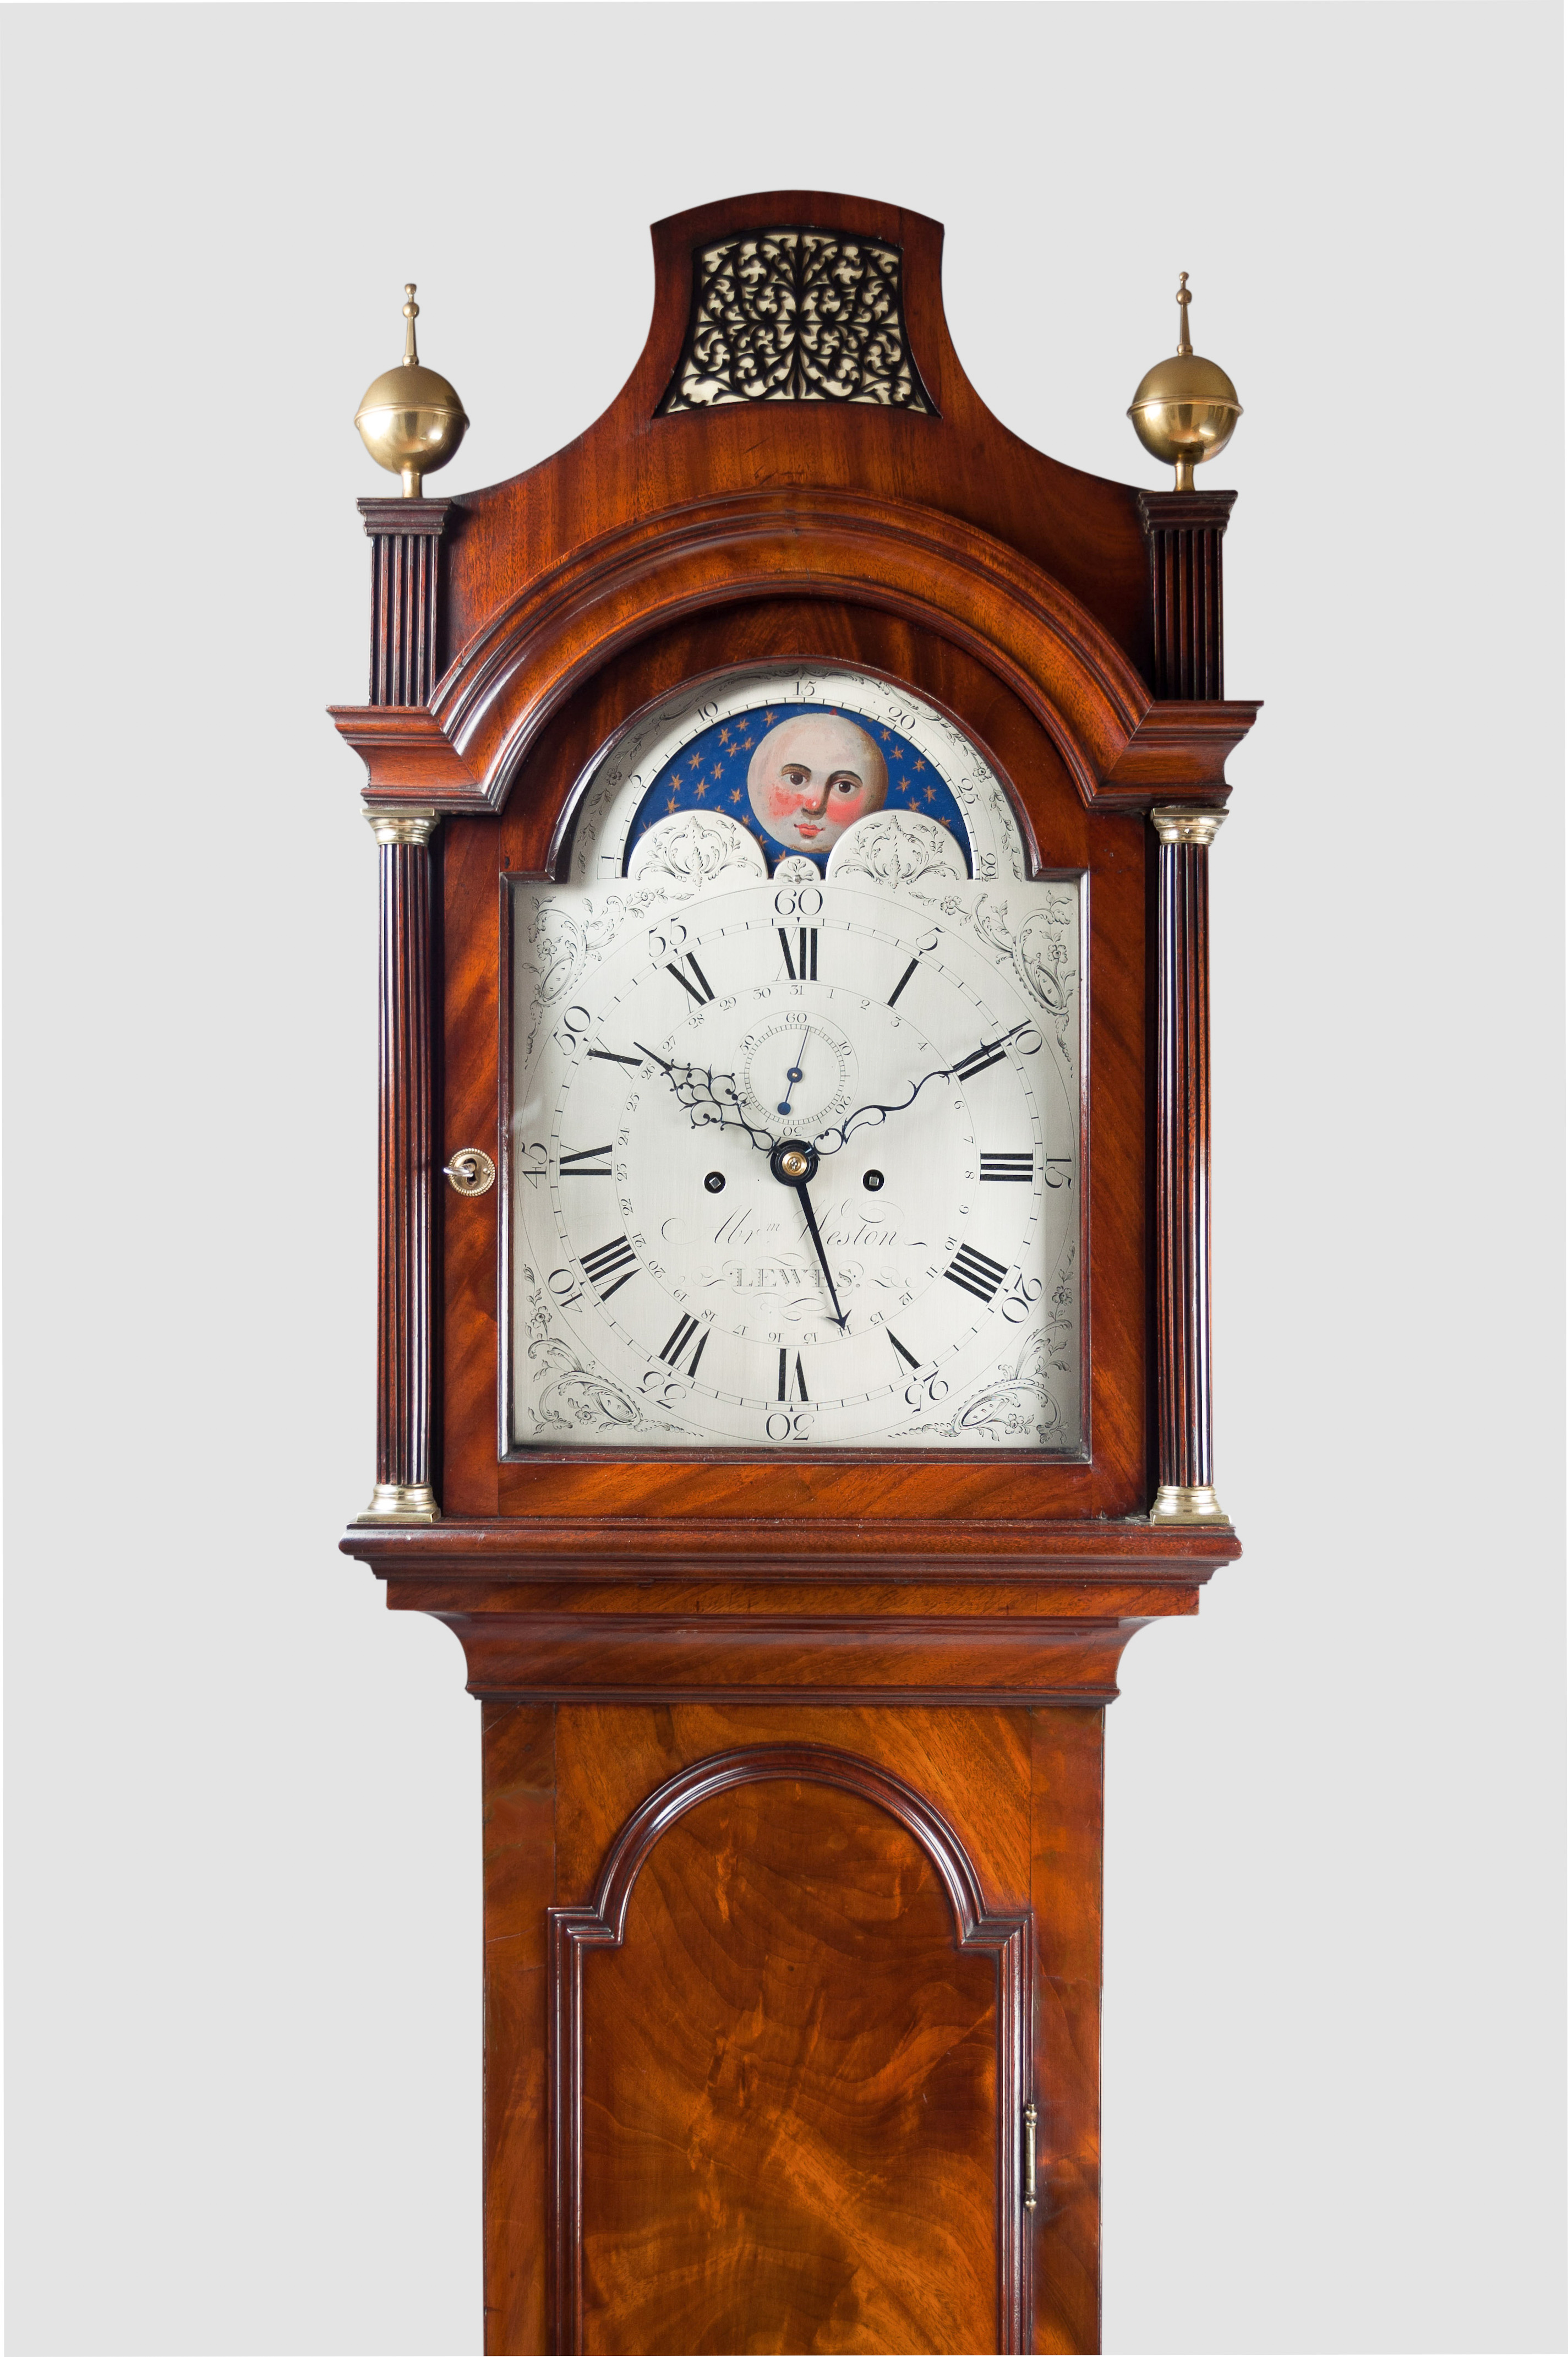 Story Antique Clocks image (11 of 11)